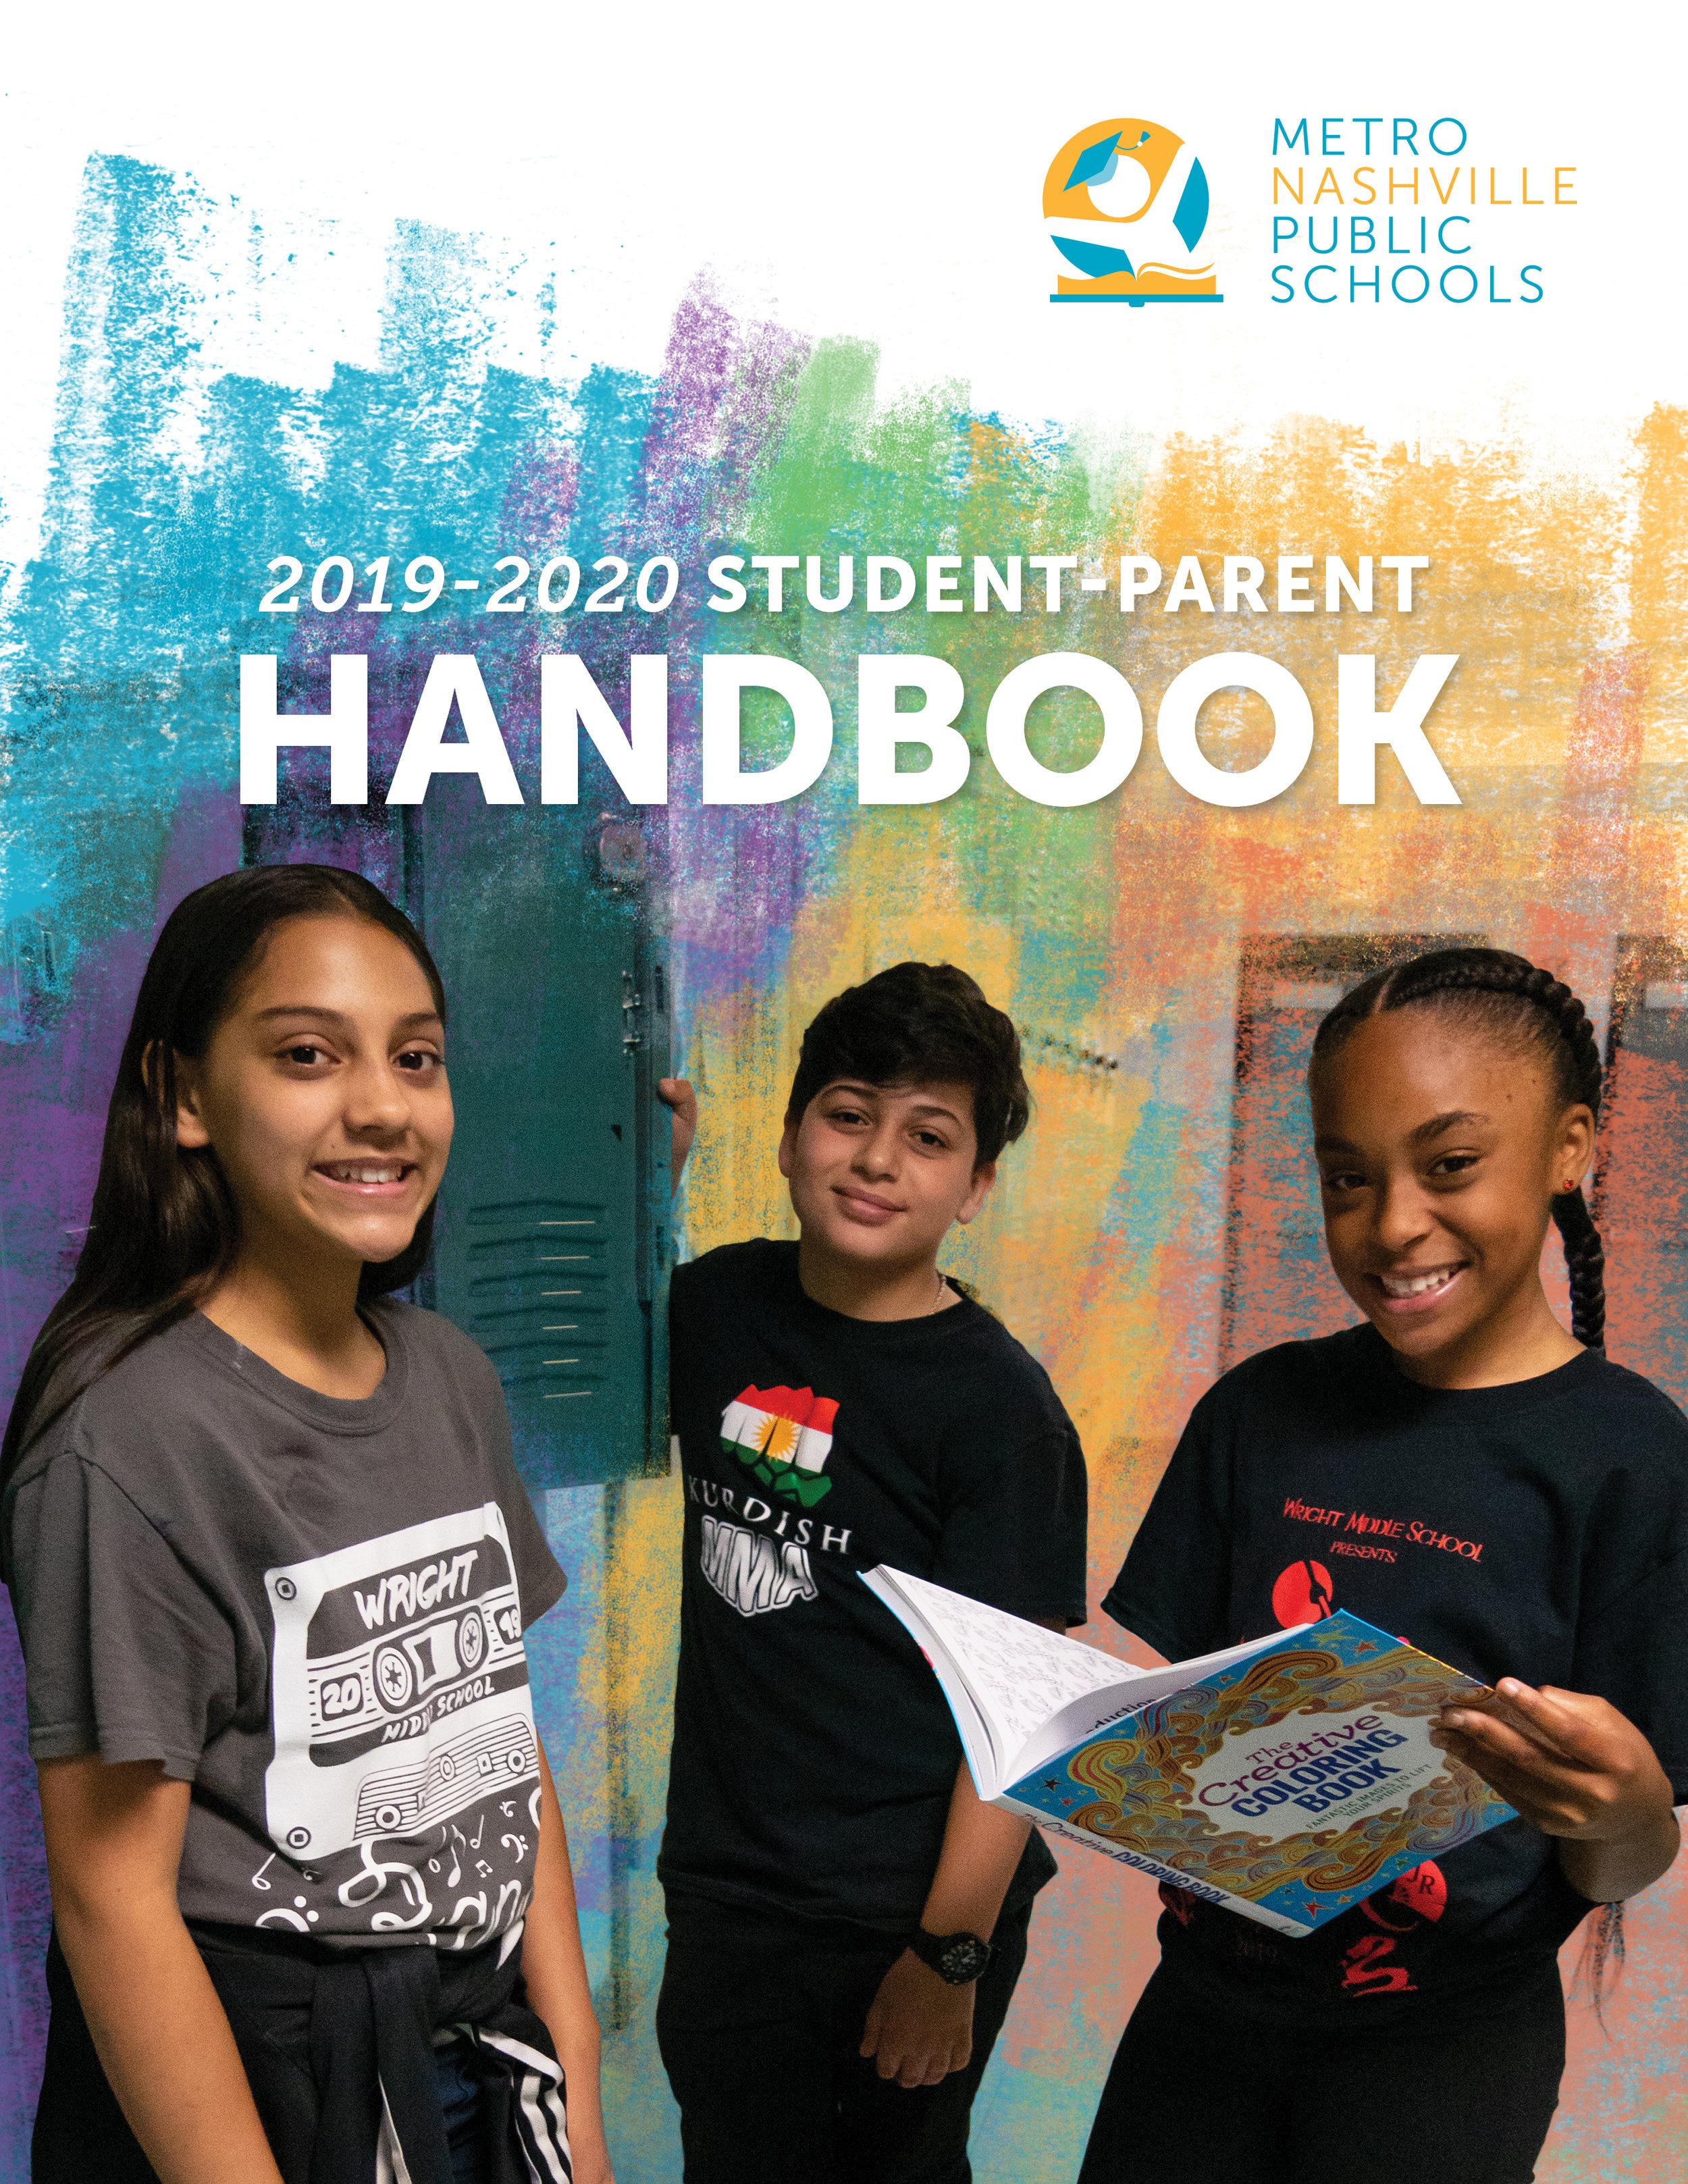 Mnps Calendar 2020.Student Parent Handbook Metro Nashville Public Schools